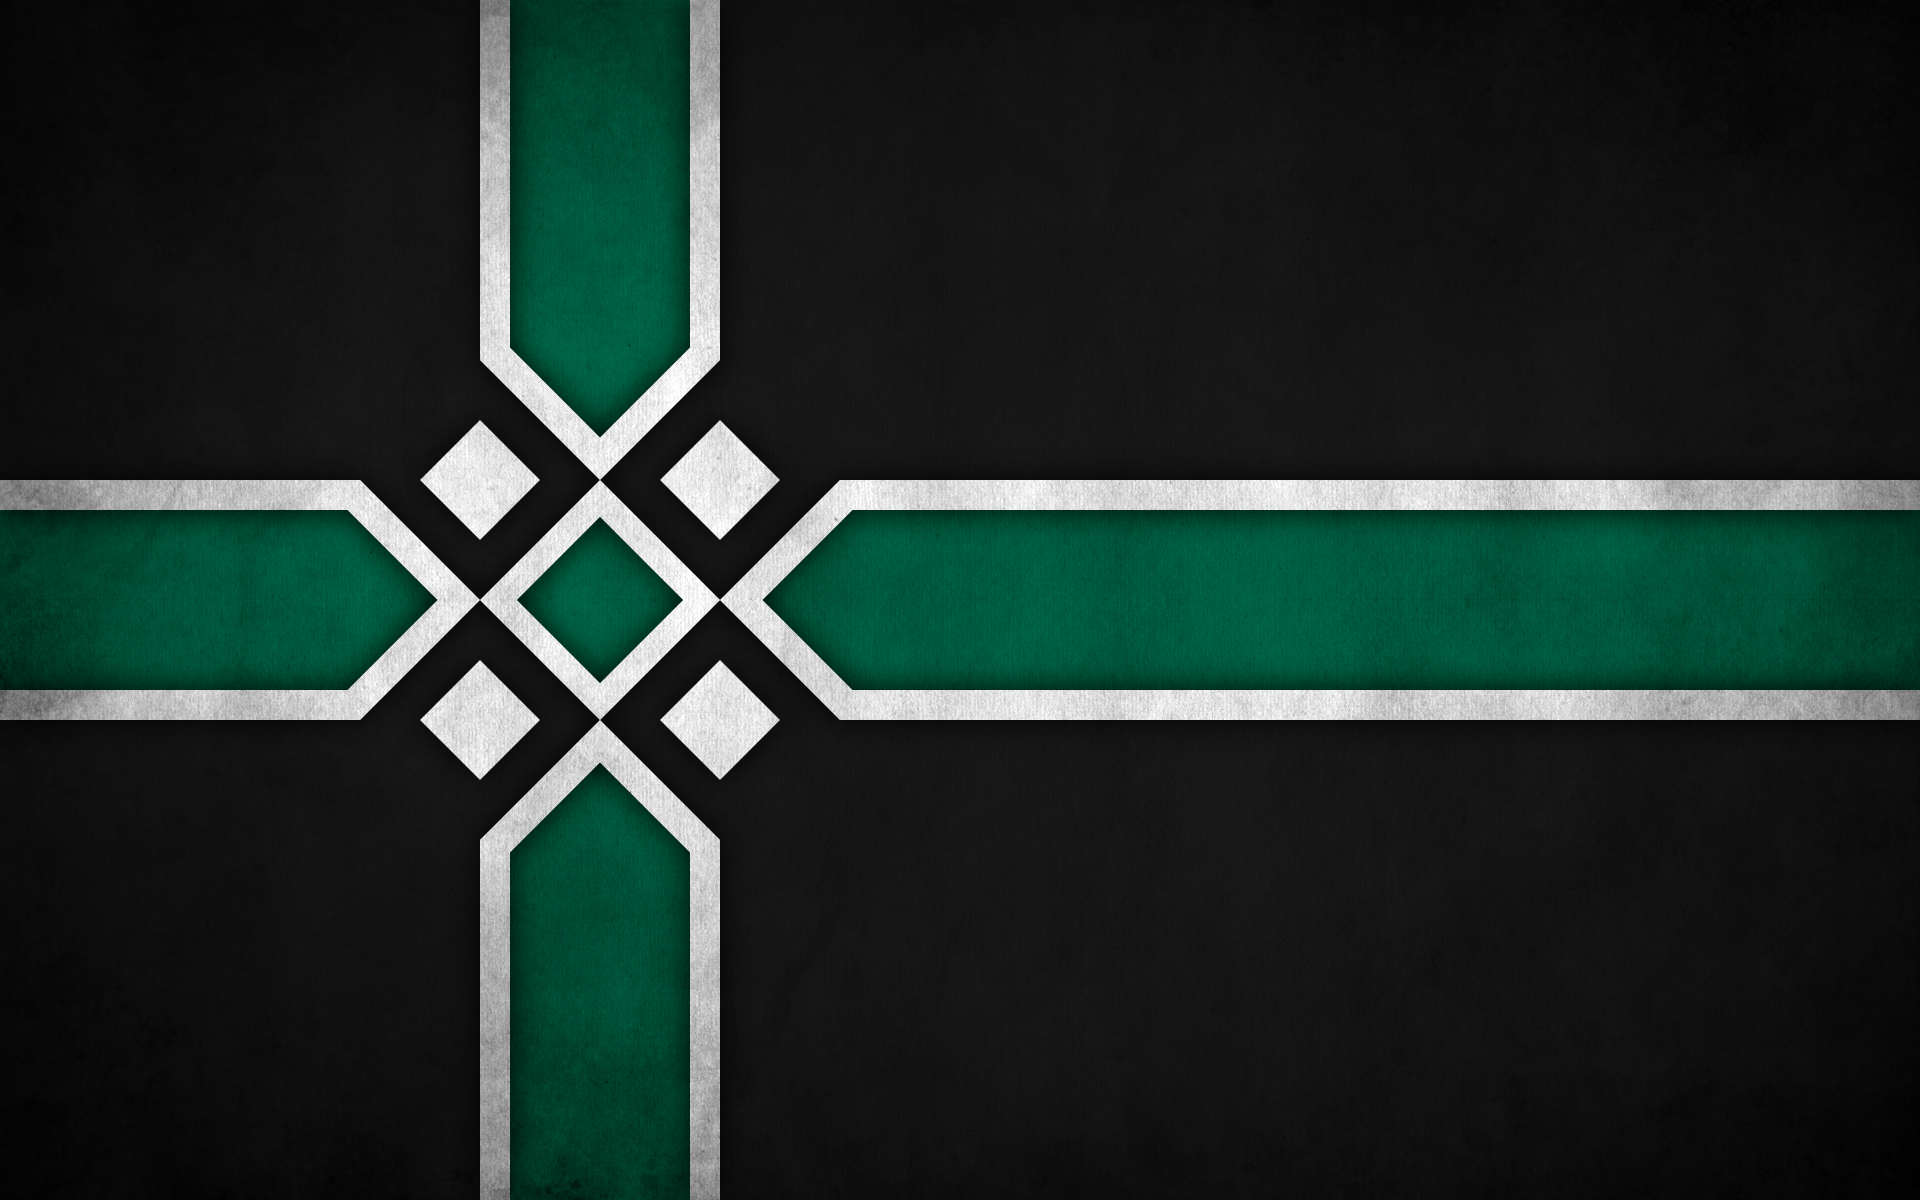 Gallery Designs Original Flag 15 By Greatpaperwolf On Deviantart